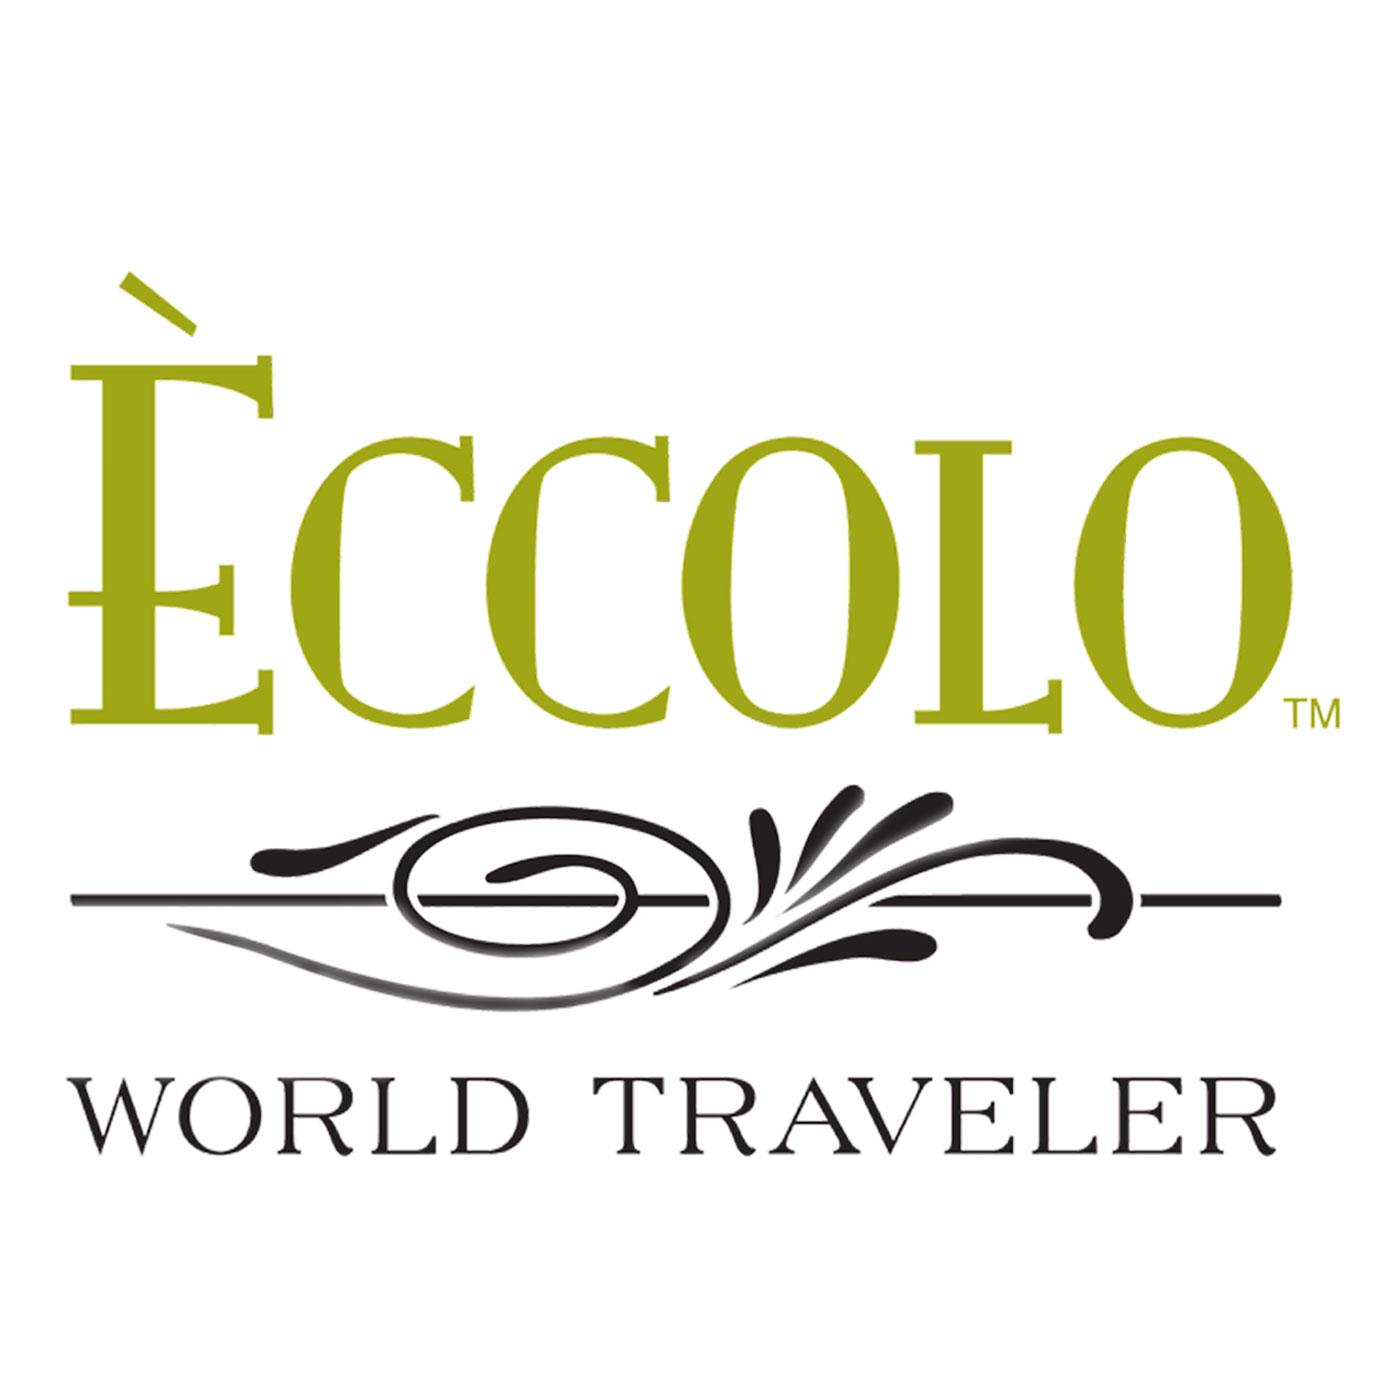 Eccolo World Traveler.jpg